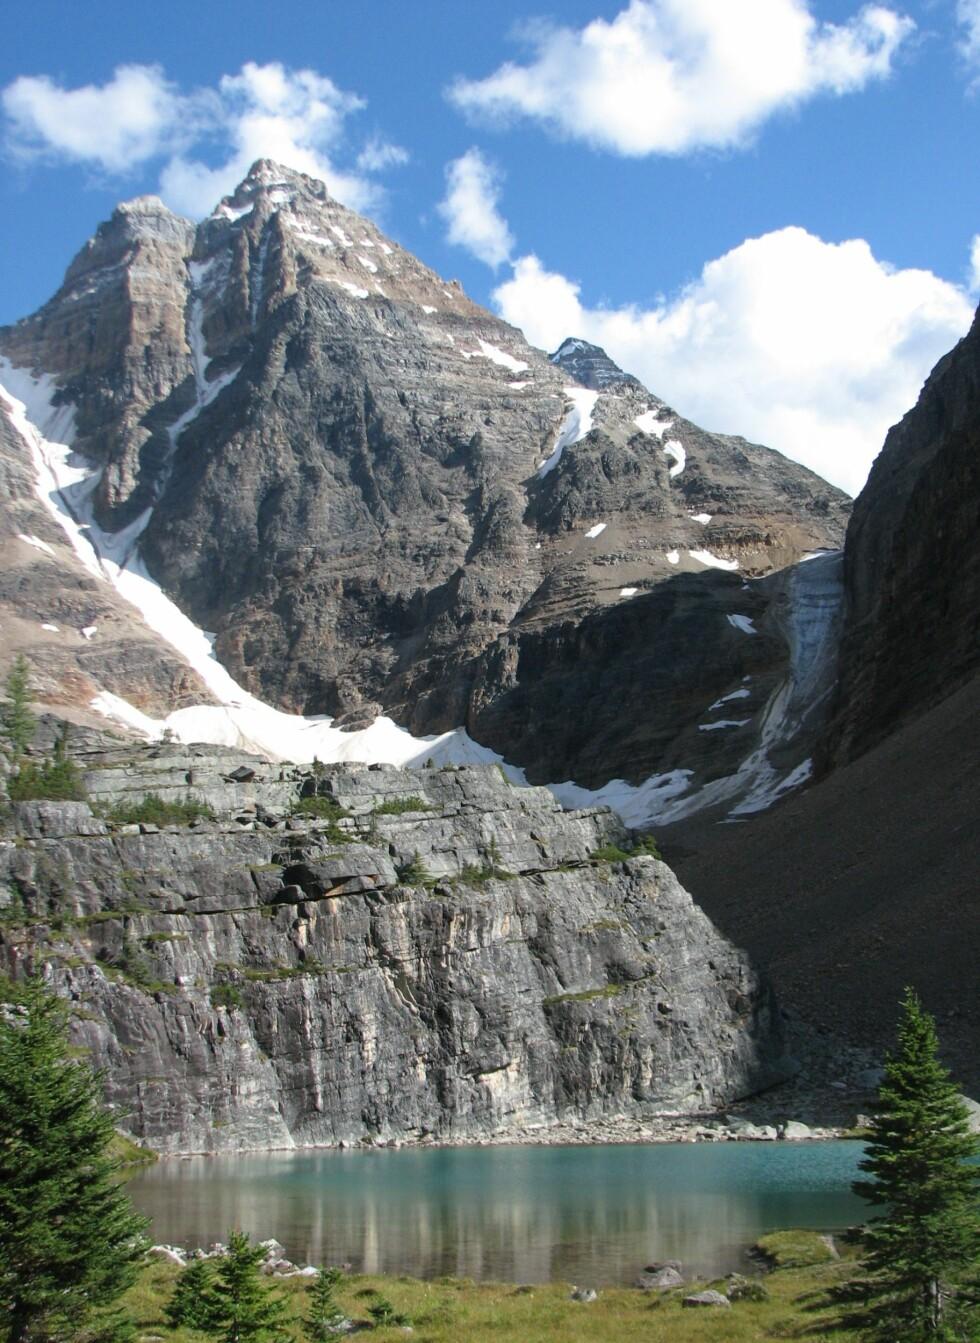 Canadian Rockies er kjent for sin gnistrende natur. Foto: Wikipedia Commons